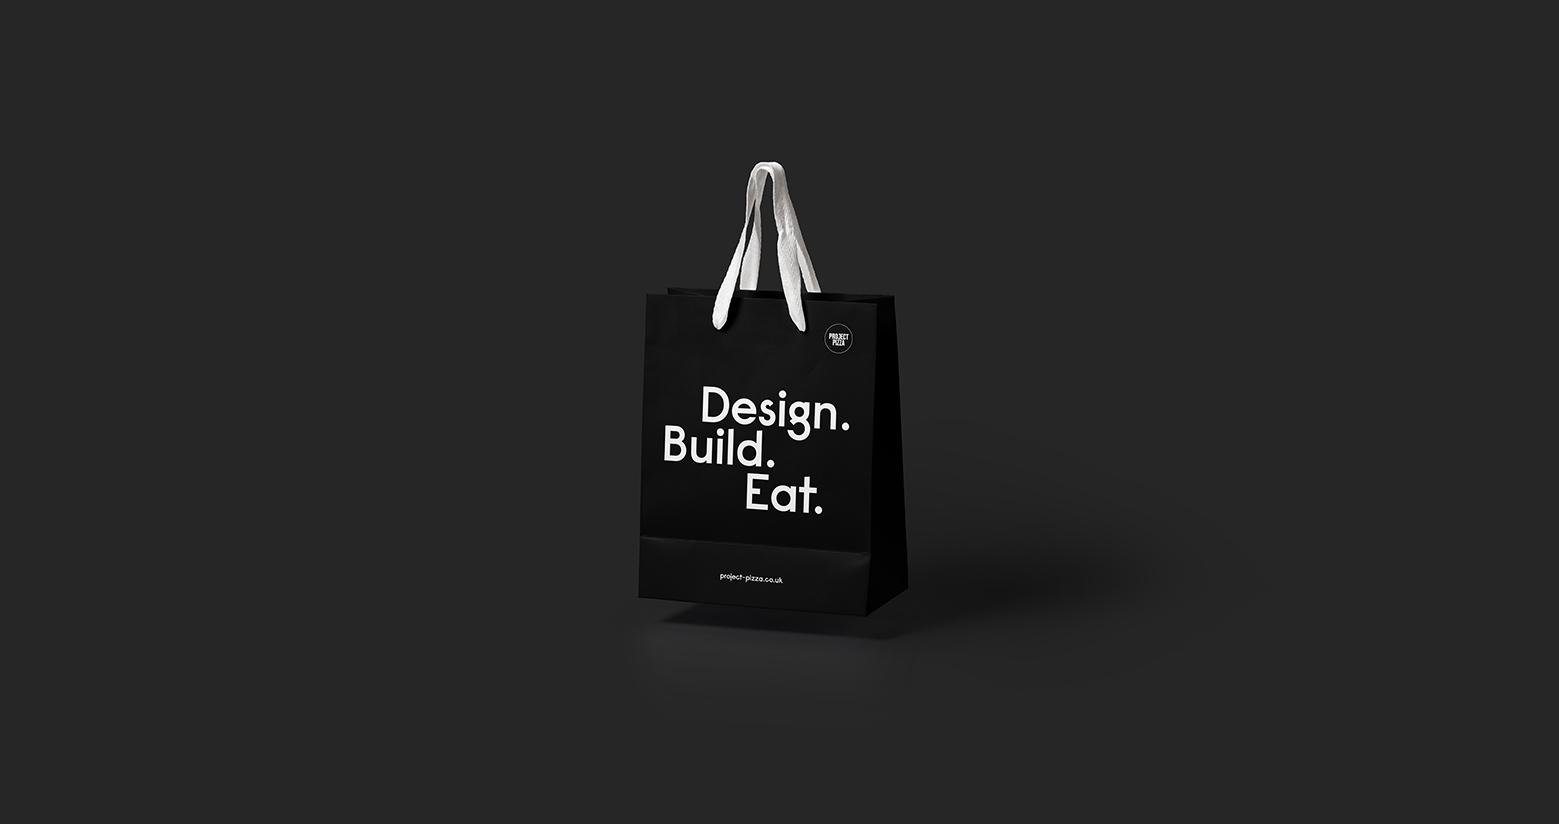 Project Pizza bag design